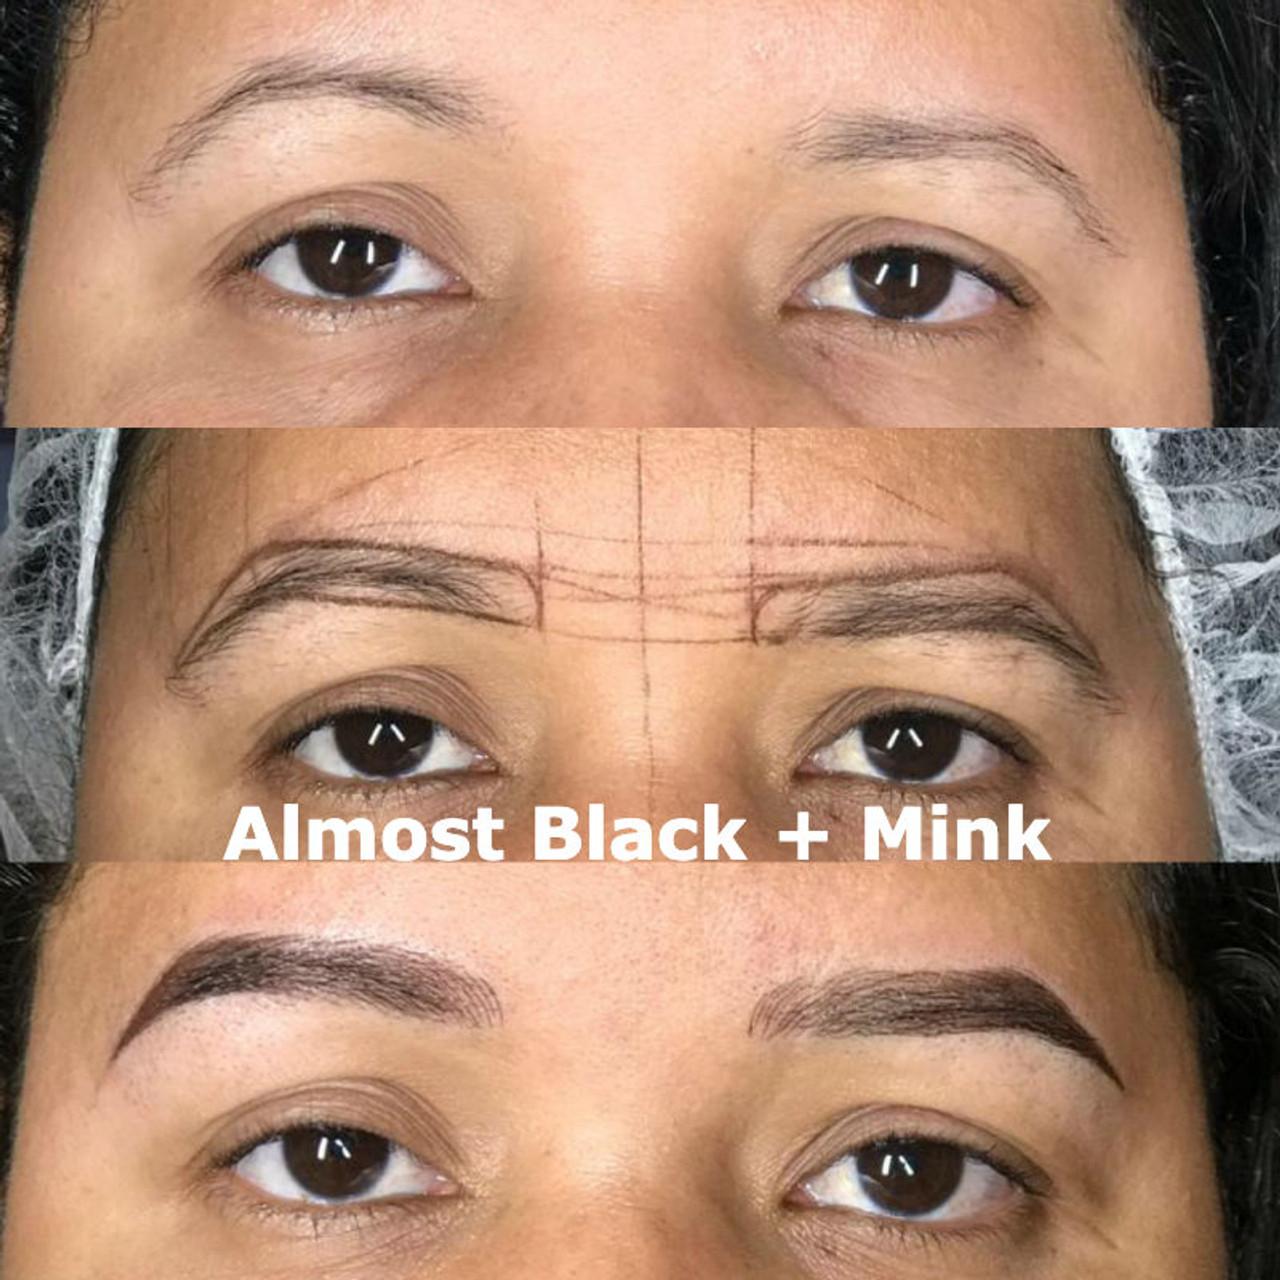 Kolorsource Permanent Makeup Pigment (PMU) Almost Black #9640 - 15ml